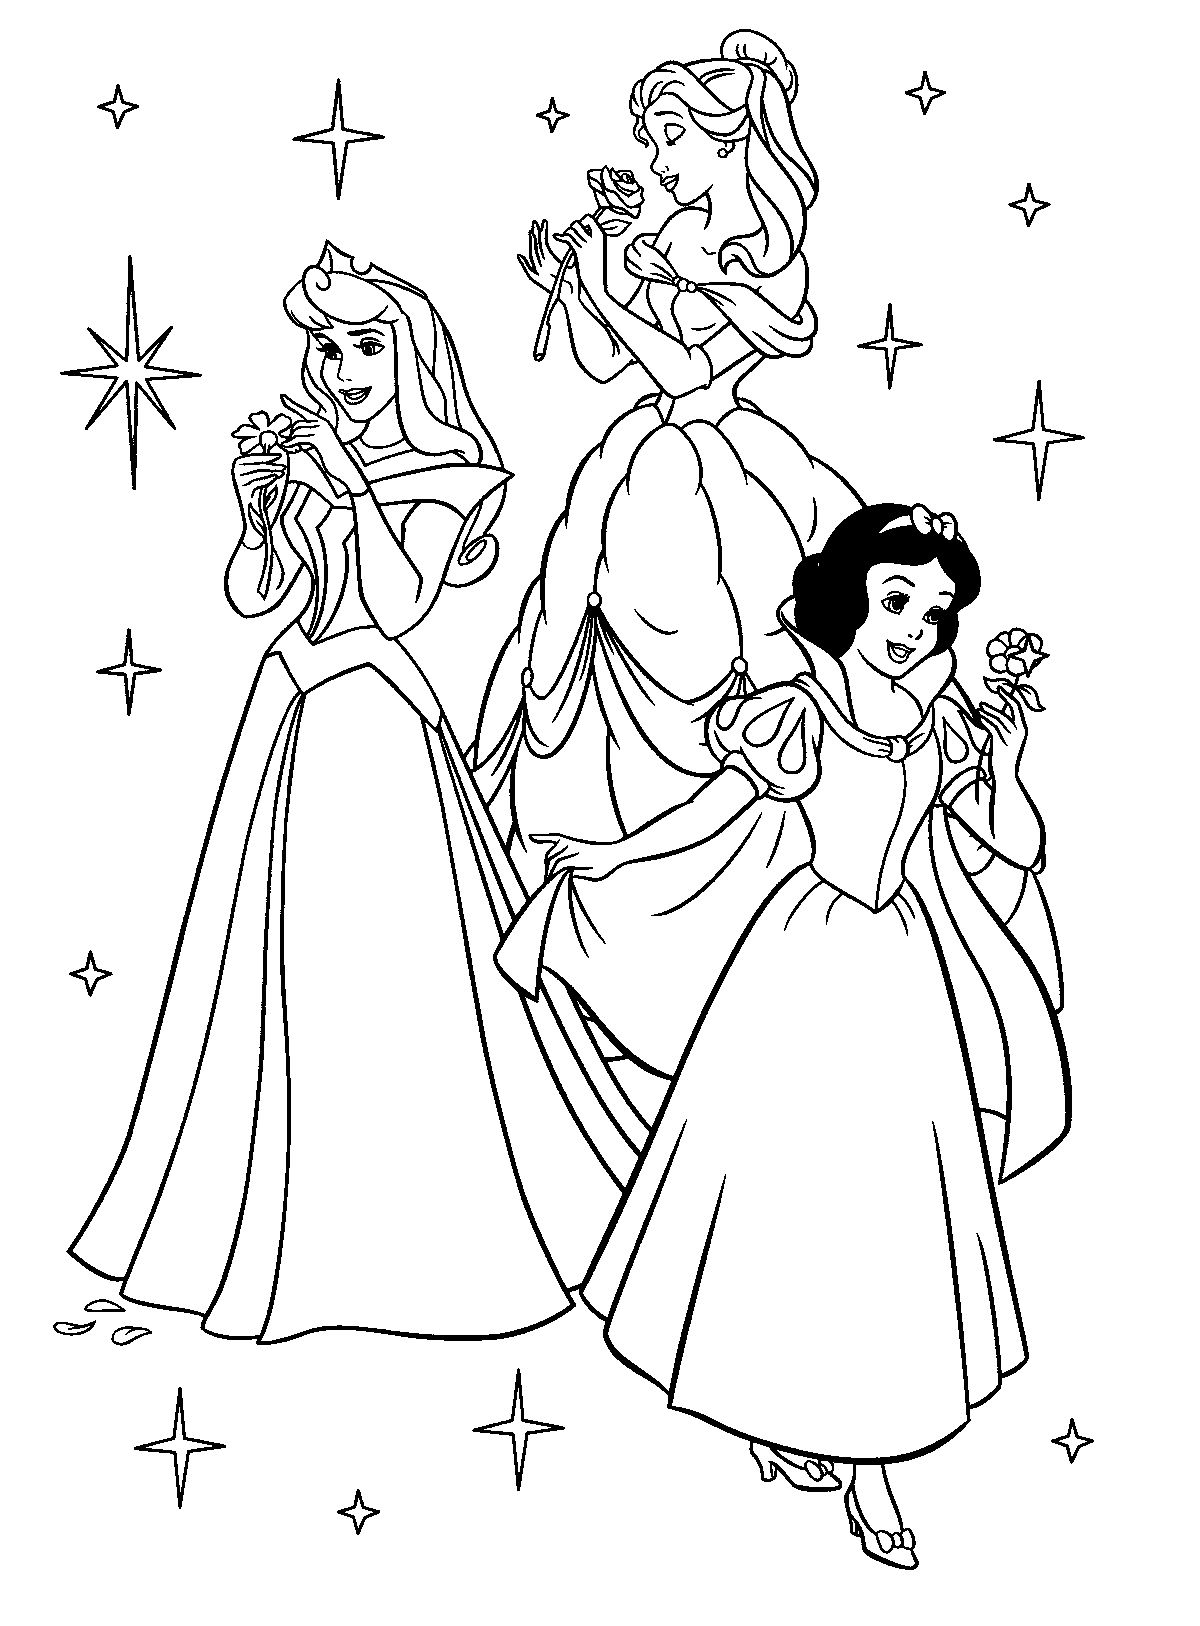 Free Printable Disney Princess Coloring Pages For Kids ... | coloring pages to print disney princess